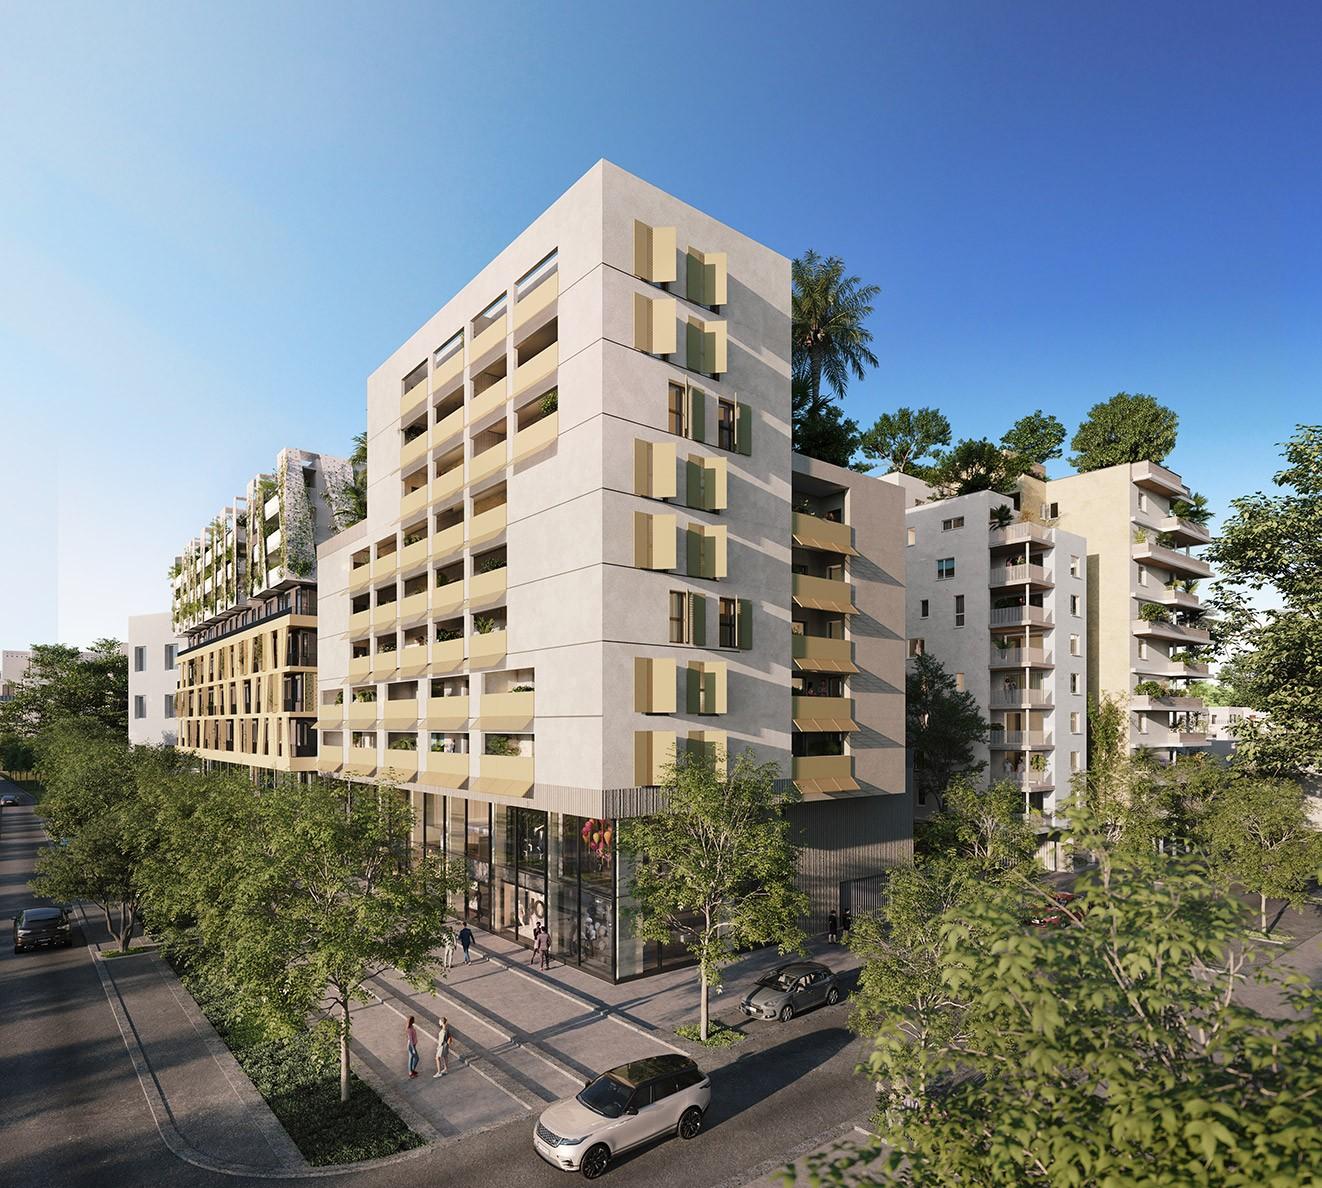 Odyssée Rive Gauche Le Mirage Montpellier Port Marianne immobilier neuf terrasse